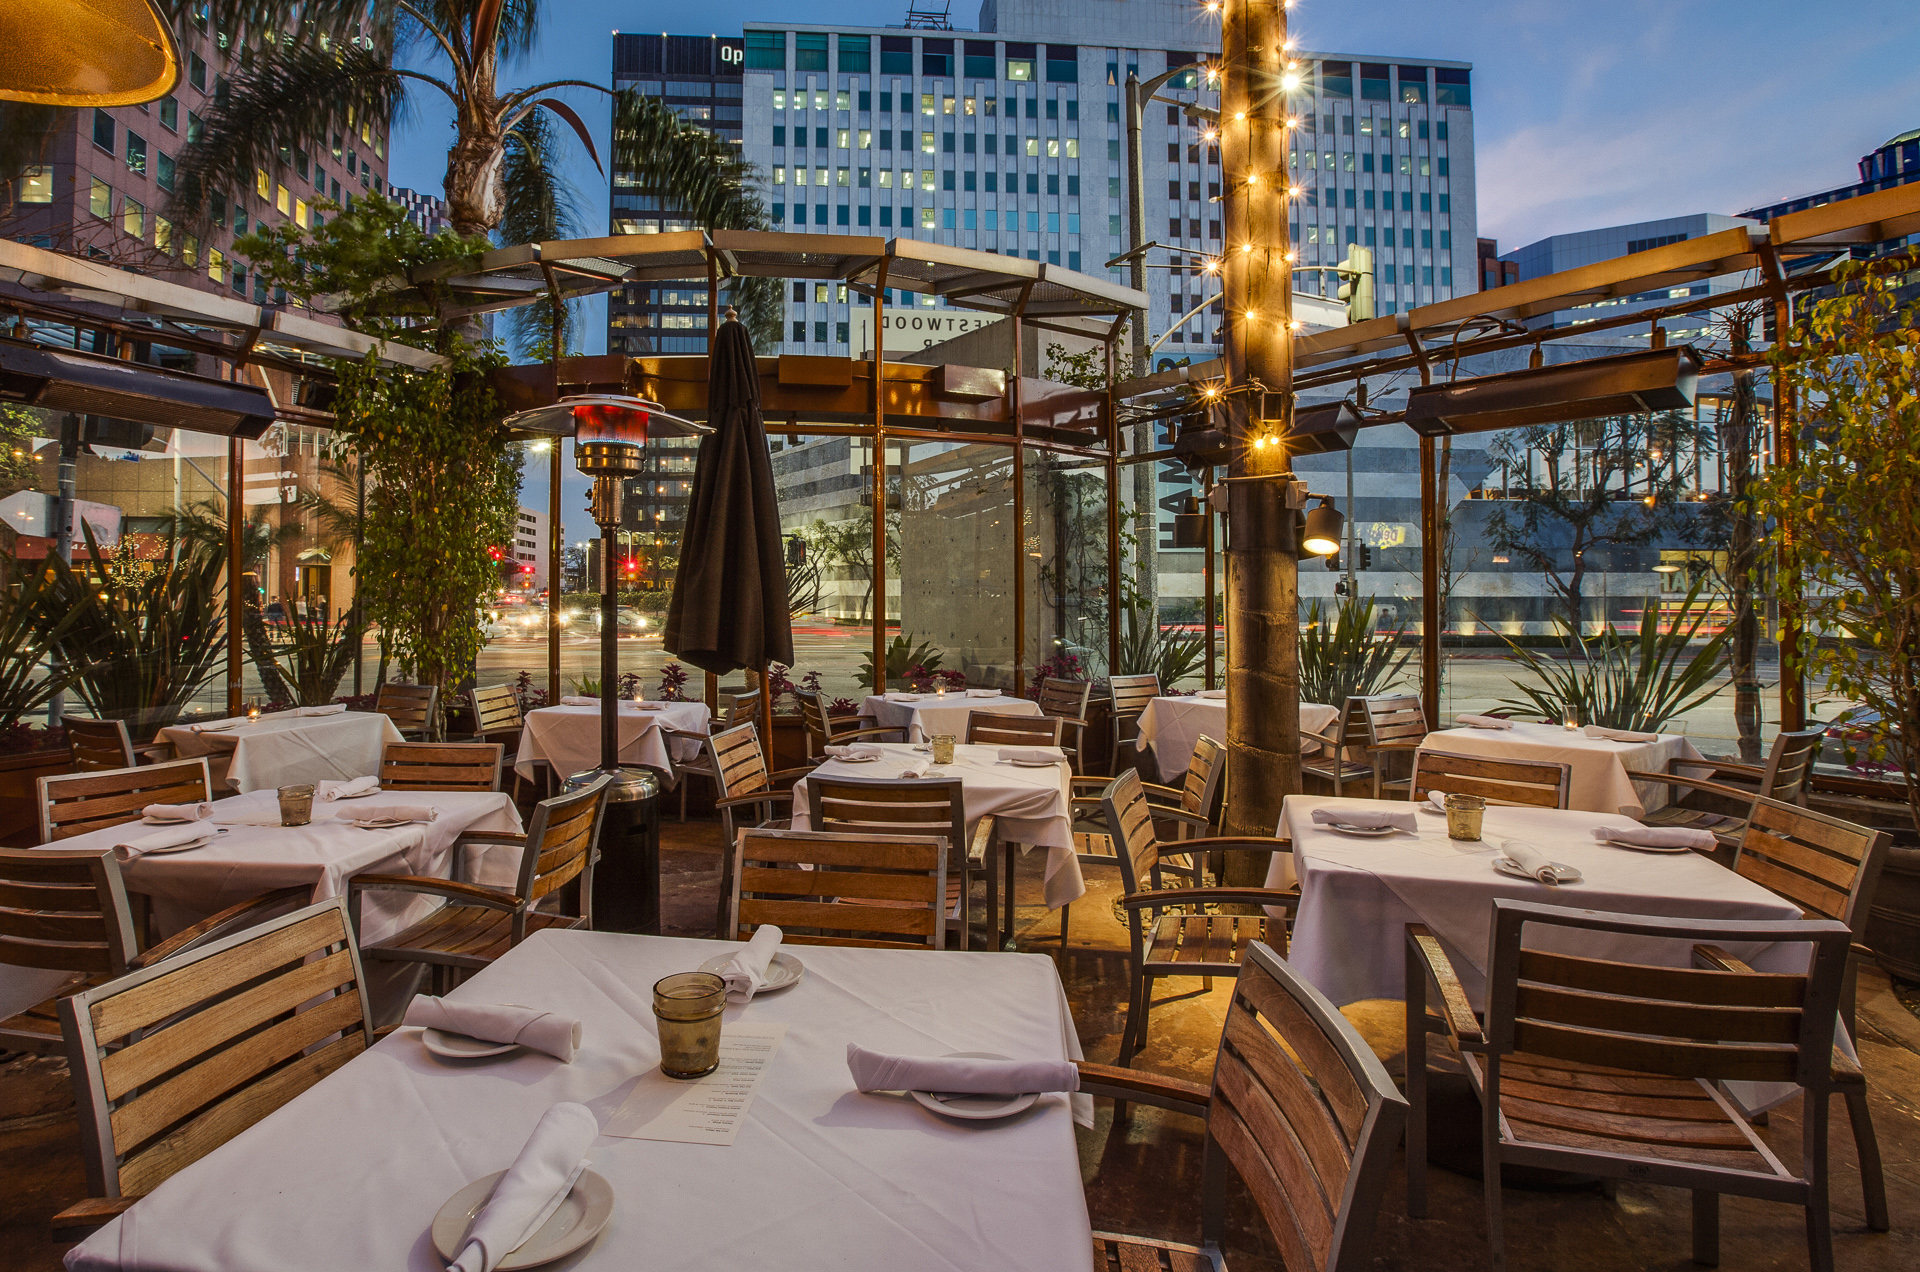 Best Downtown La Restaurants 2017